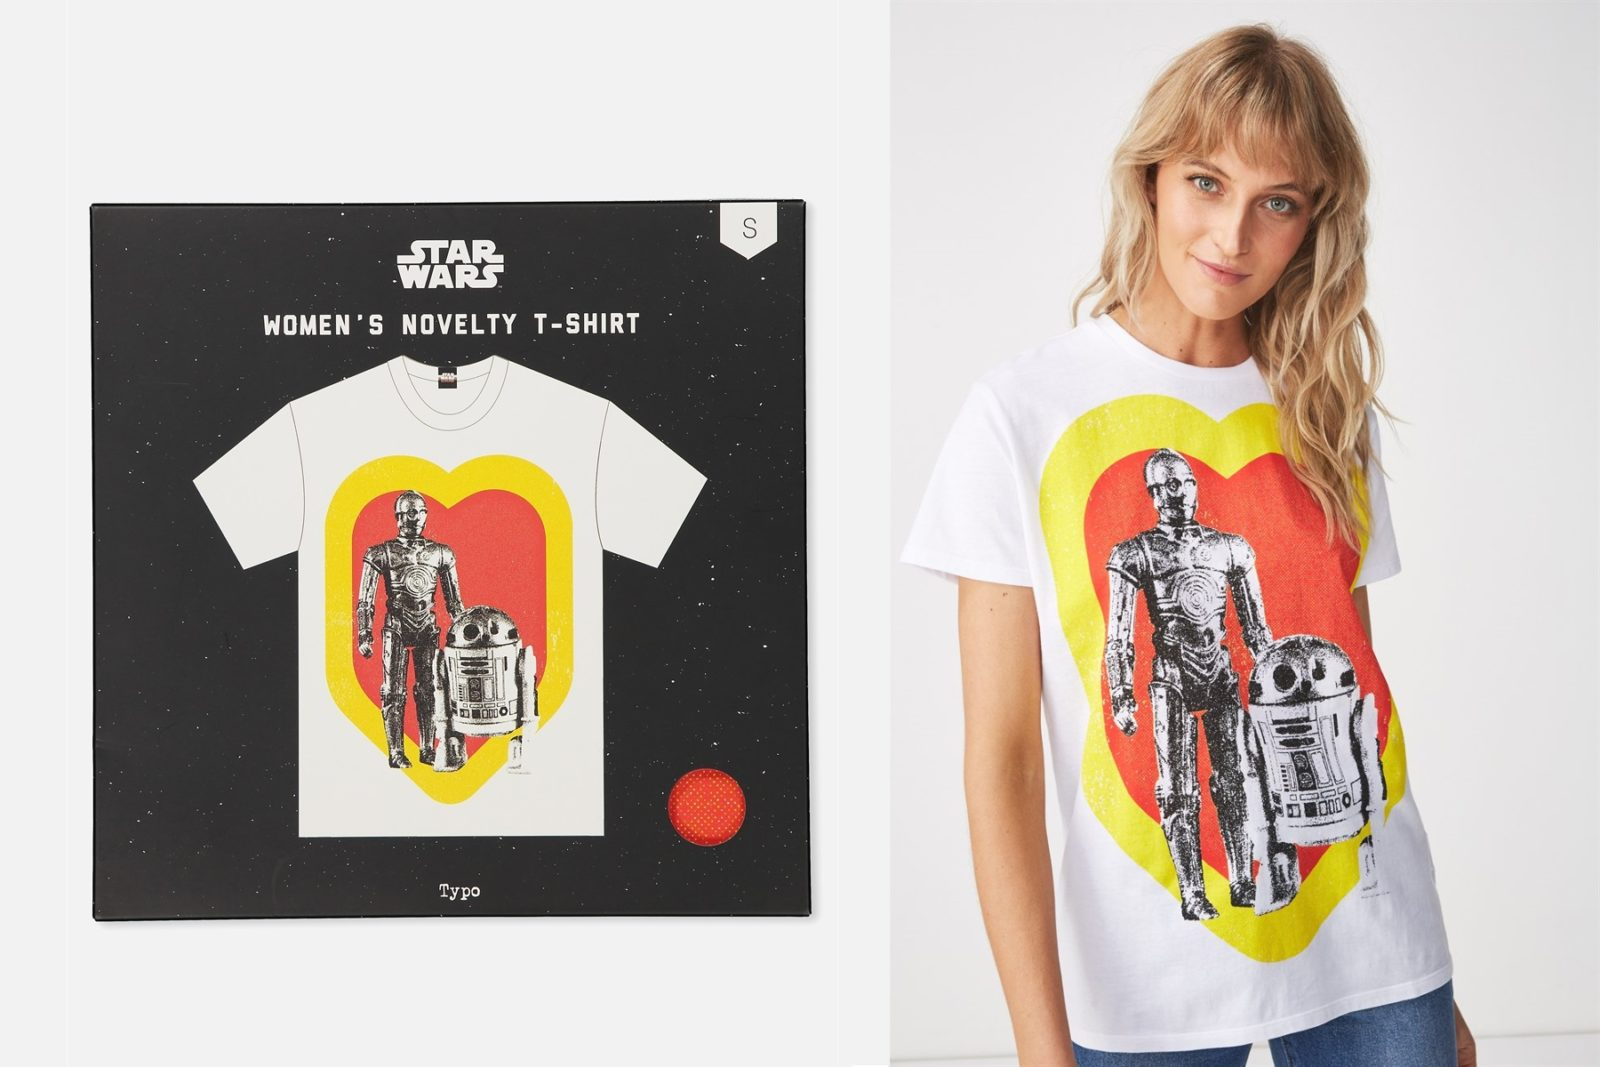 Women's C-3PO & R2-D2 Print T-Shirt at Typo